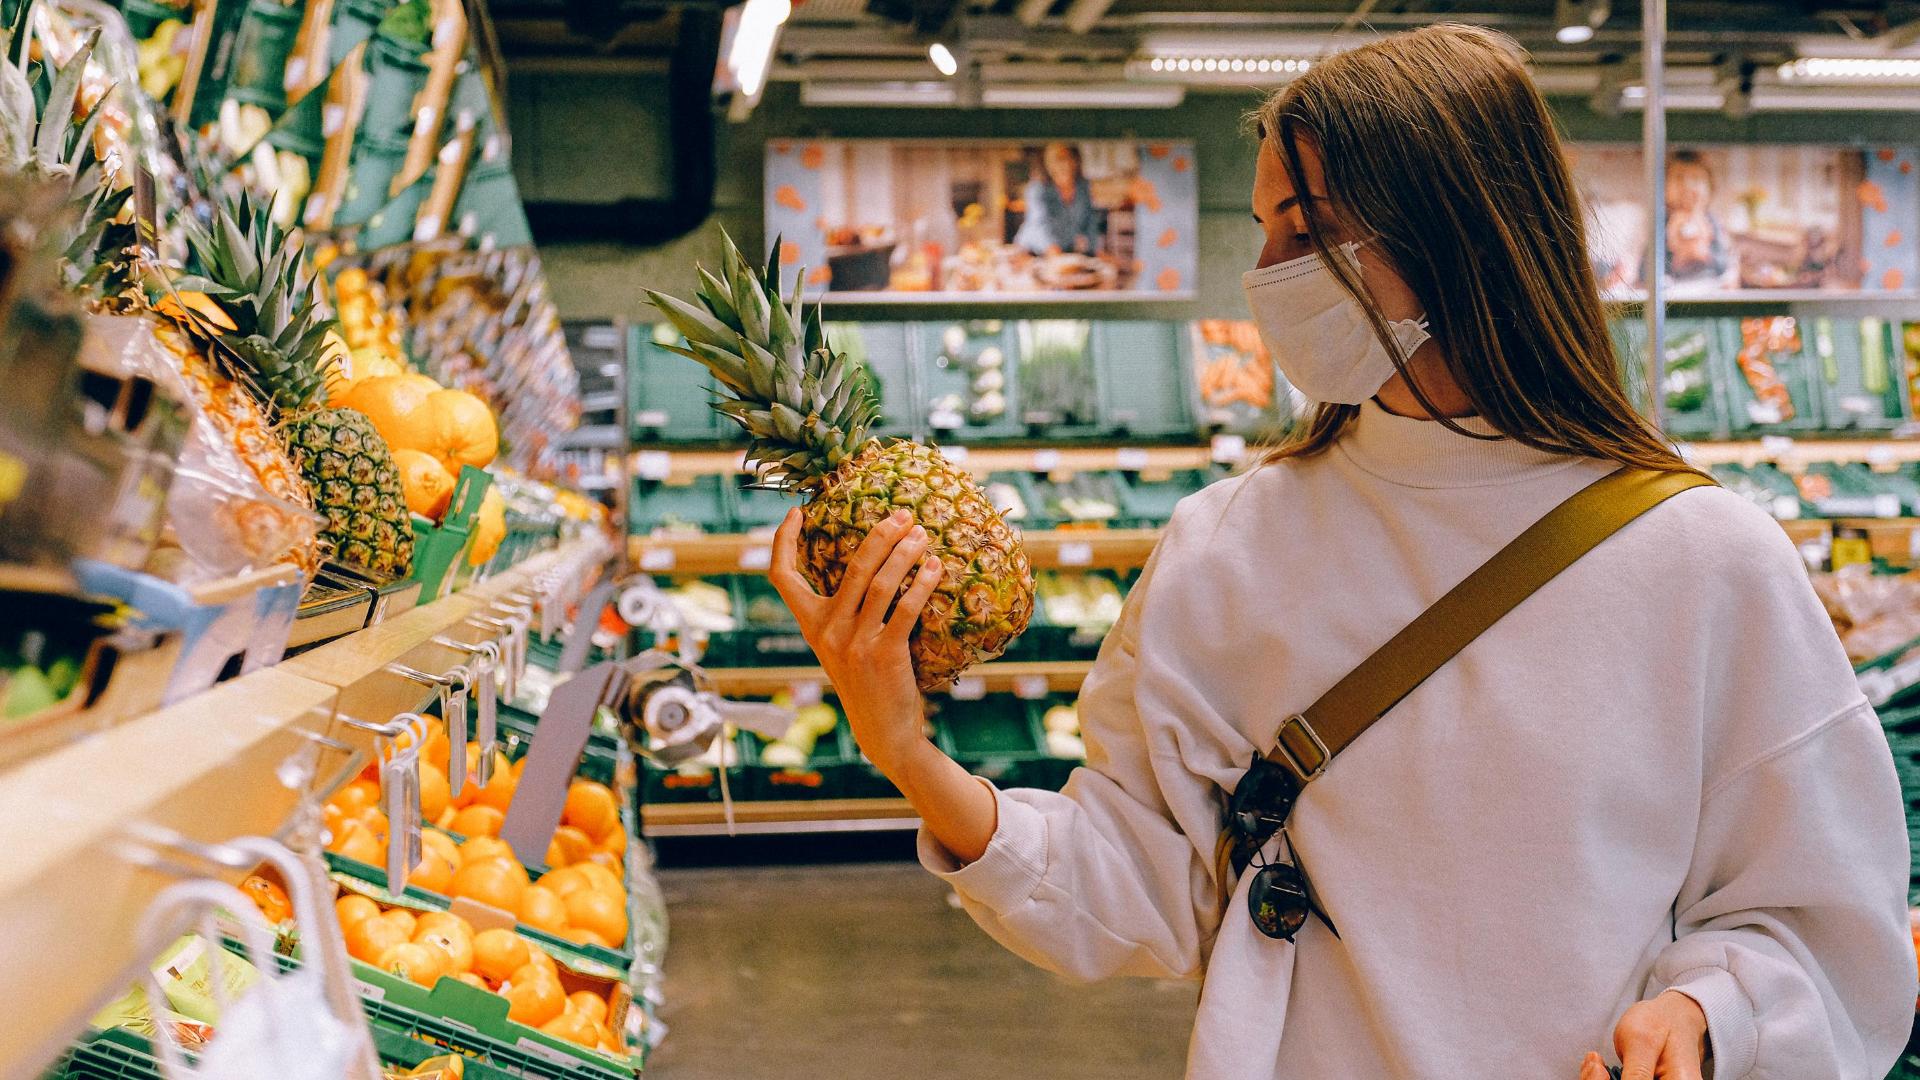 5 Ways Retailers Can Grow In The Post-Corona Economy